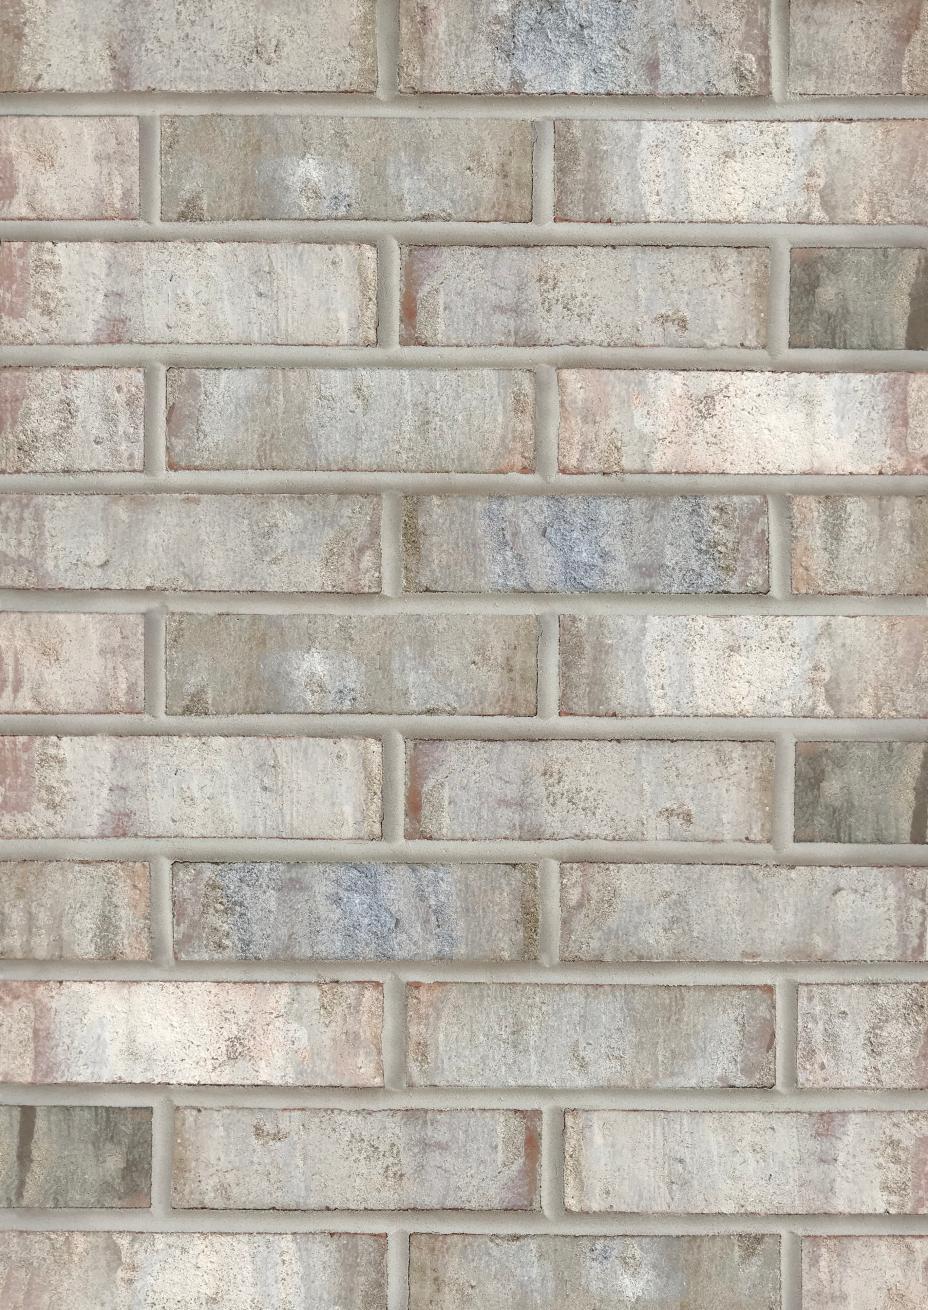 Smokey River Brick